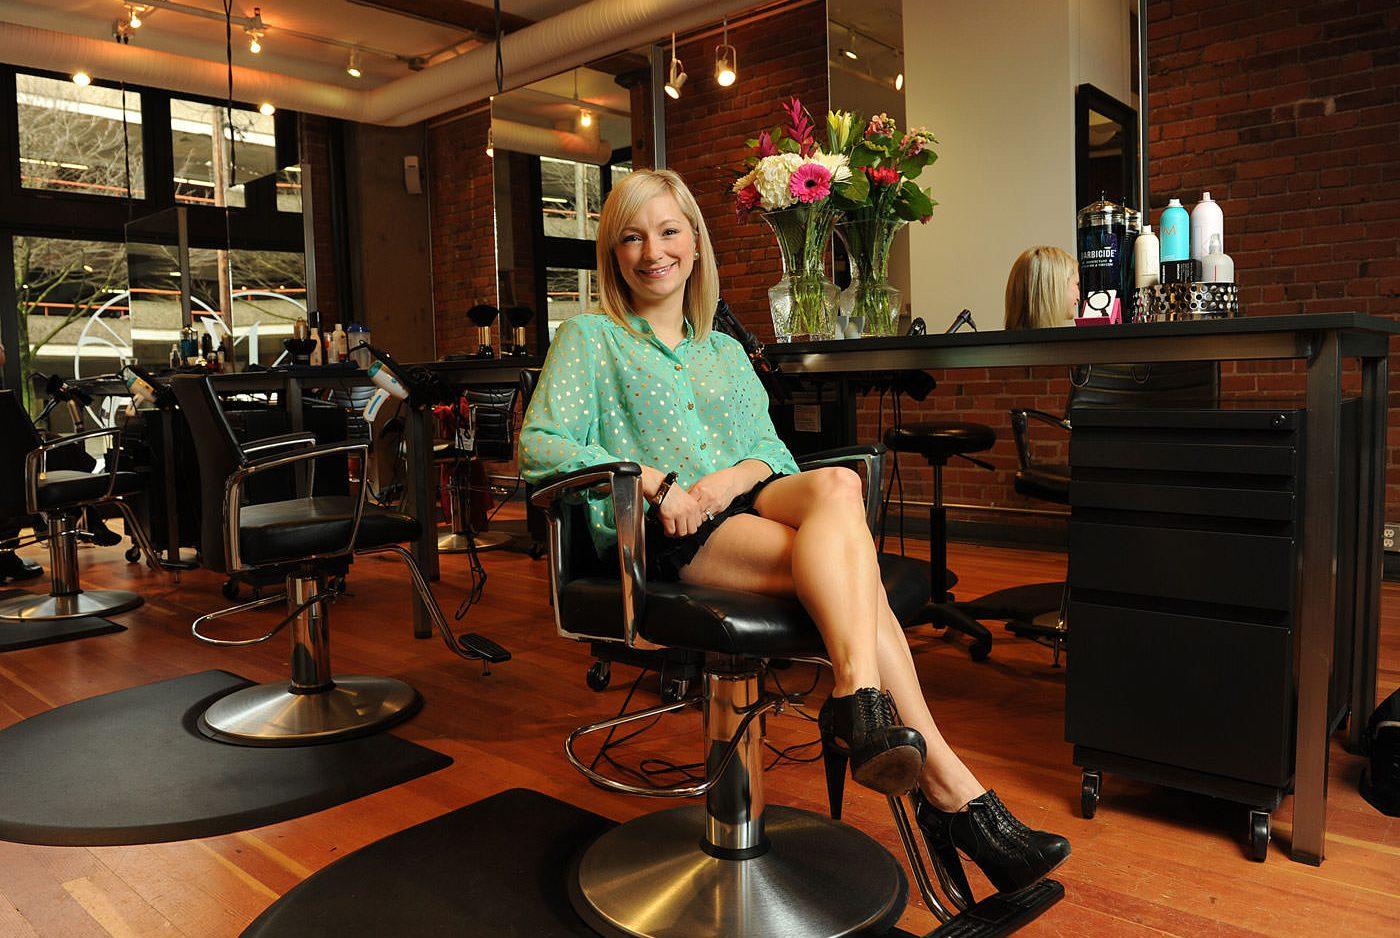 Pro Hair Graduate Pamela Jacek-Shapiro Finds Freedom at Workshop Salon